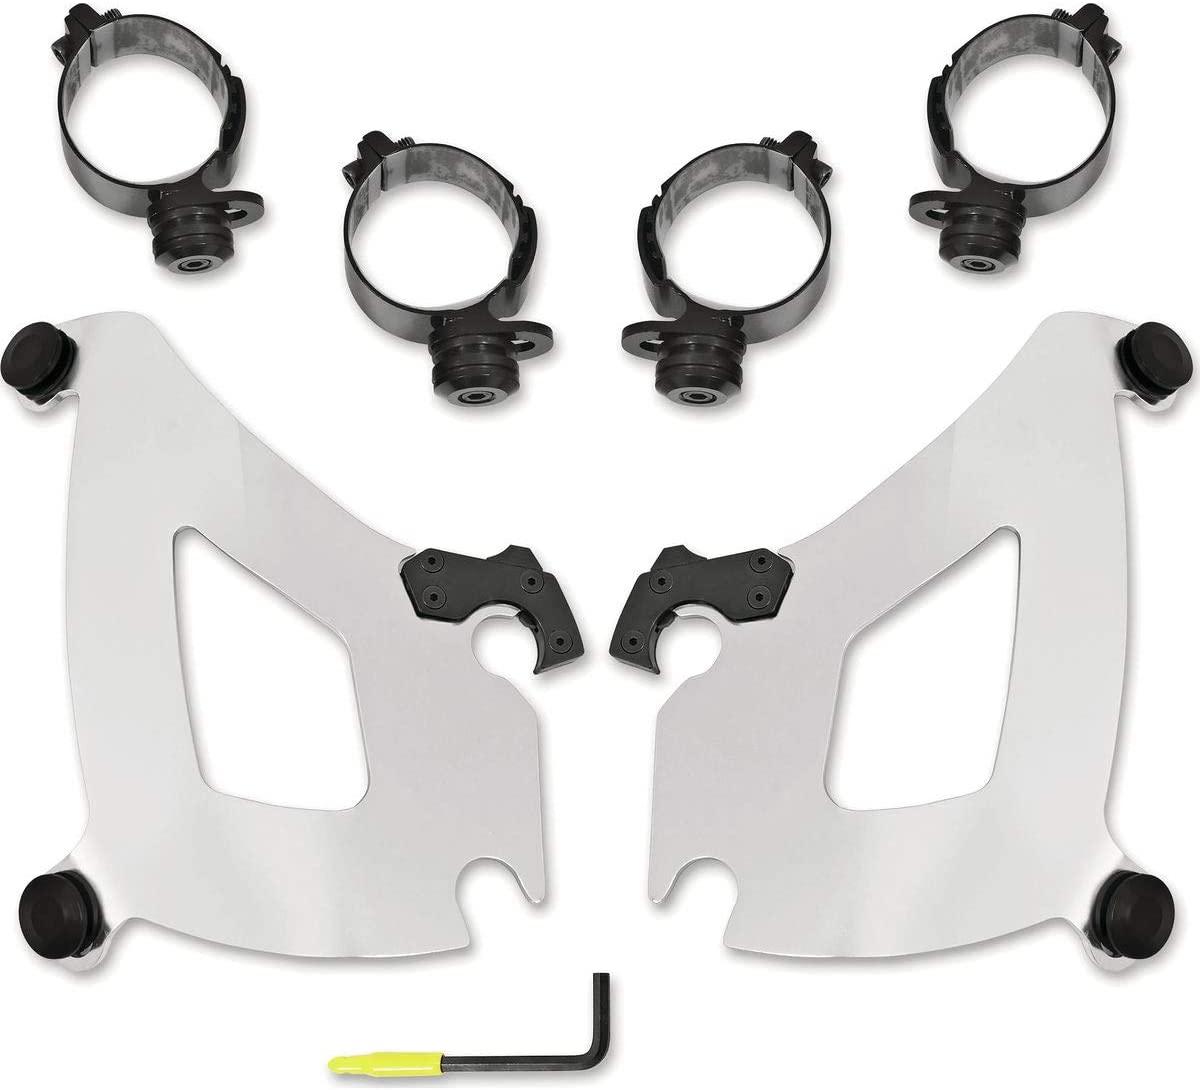 Memphis Shades Trigger-Lock Mounting Kit (Polished/Bullet Fairing) for 18-20 Harley FLSB